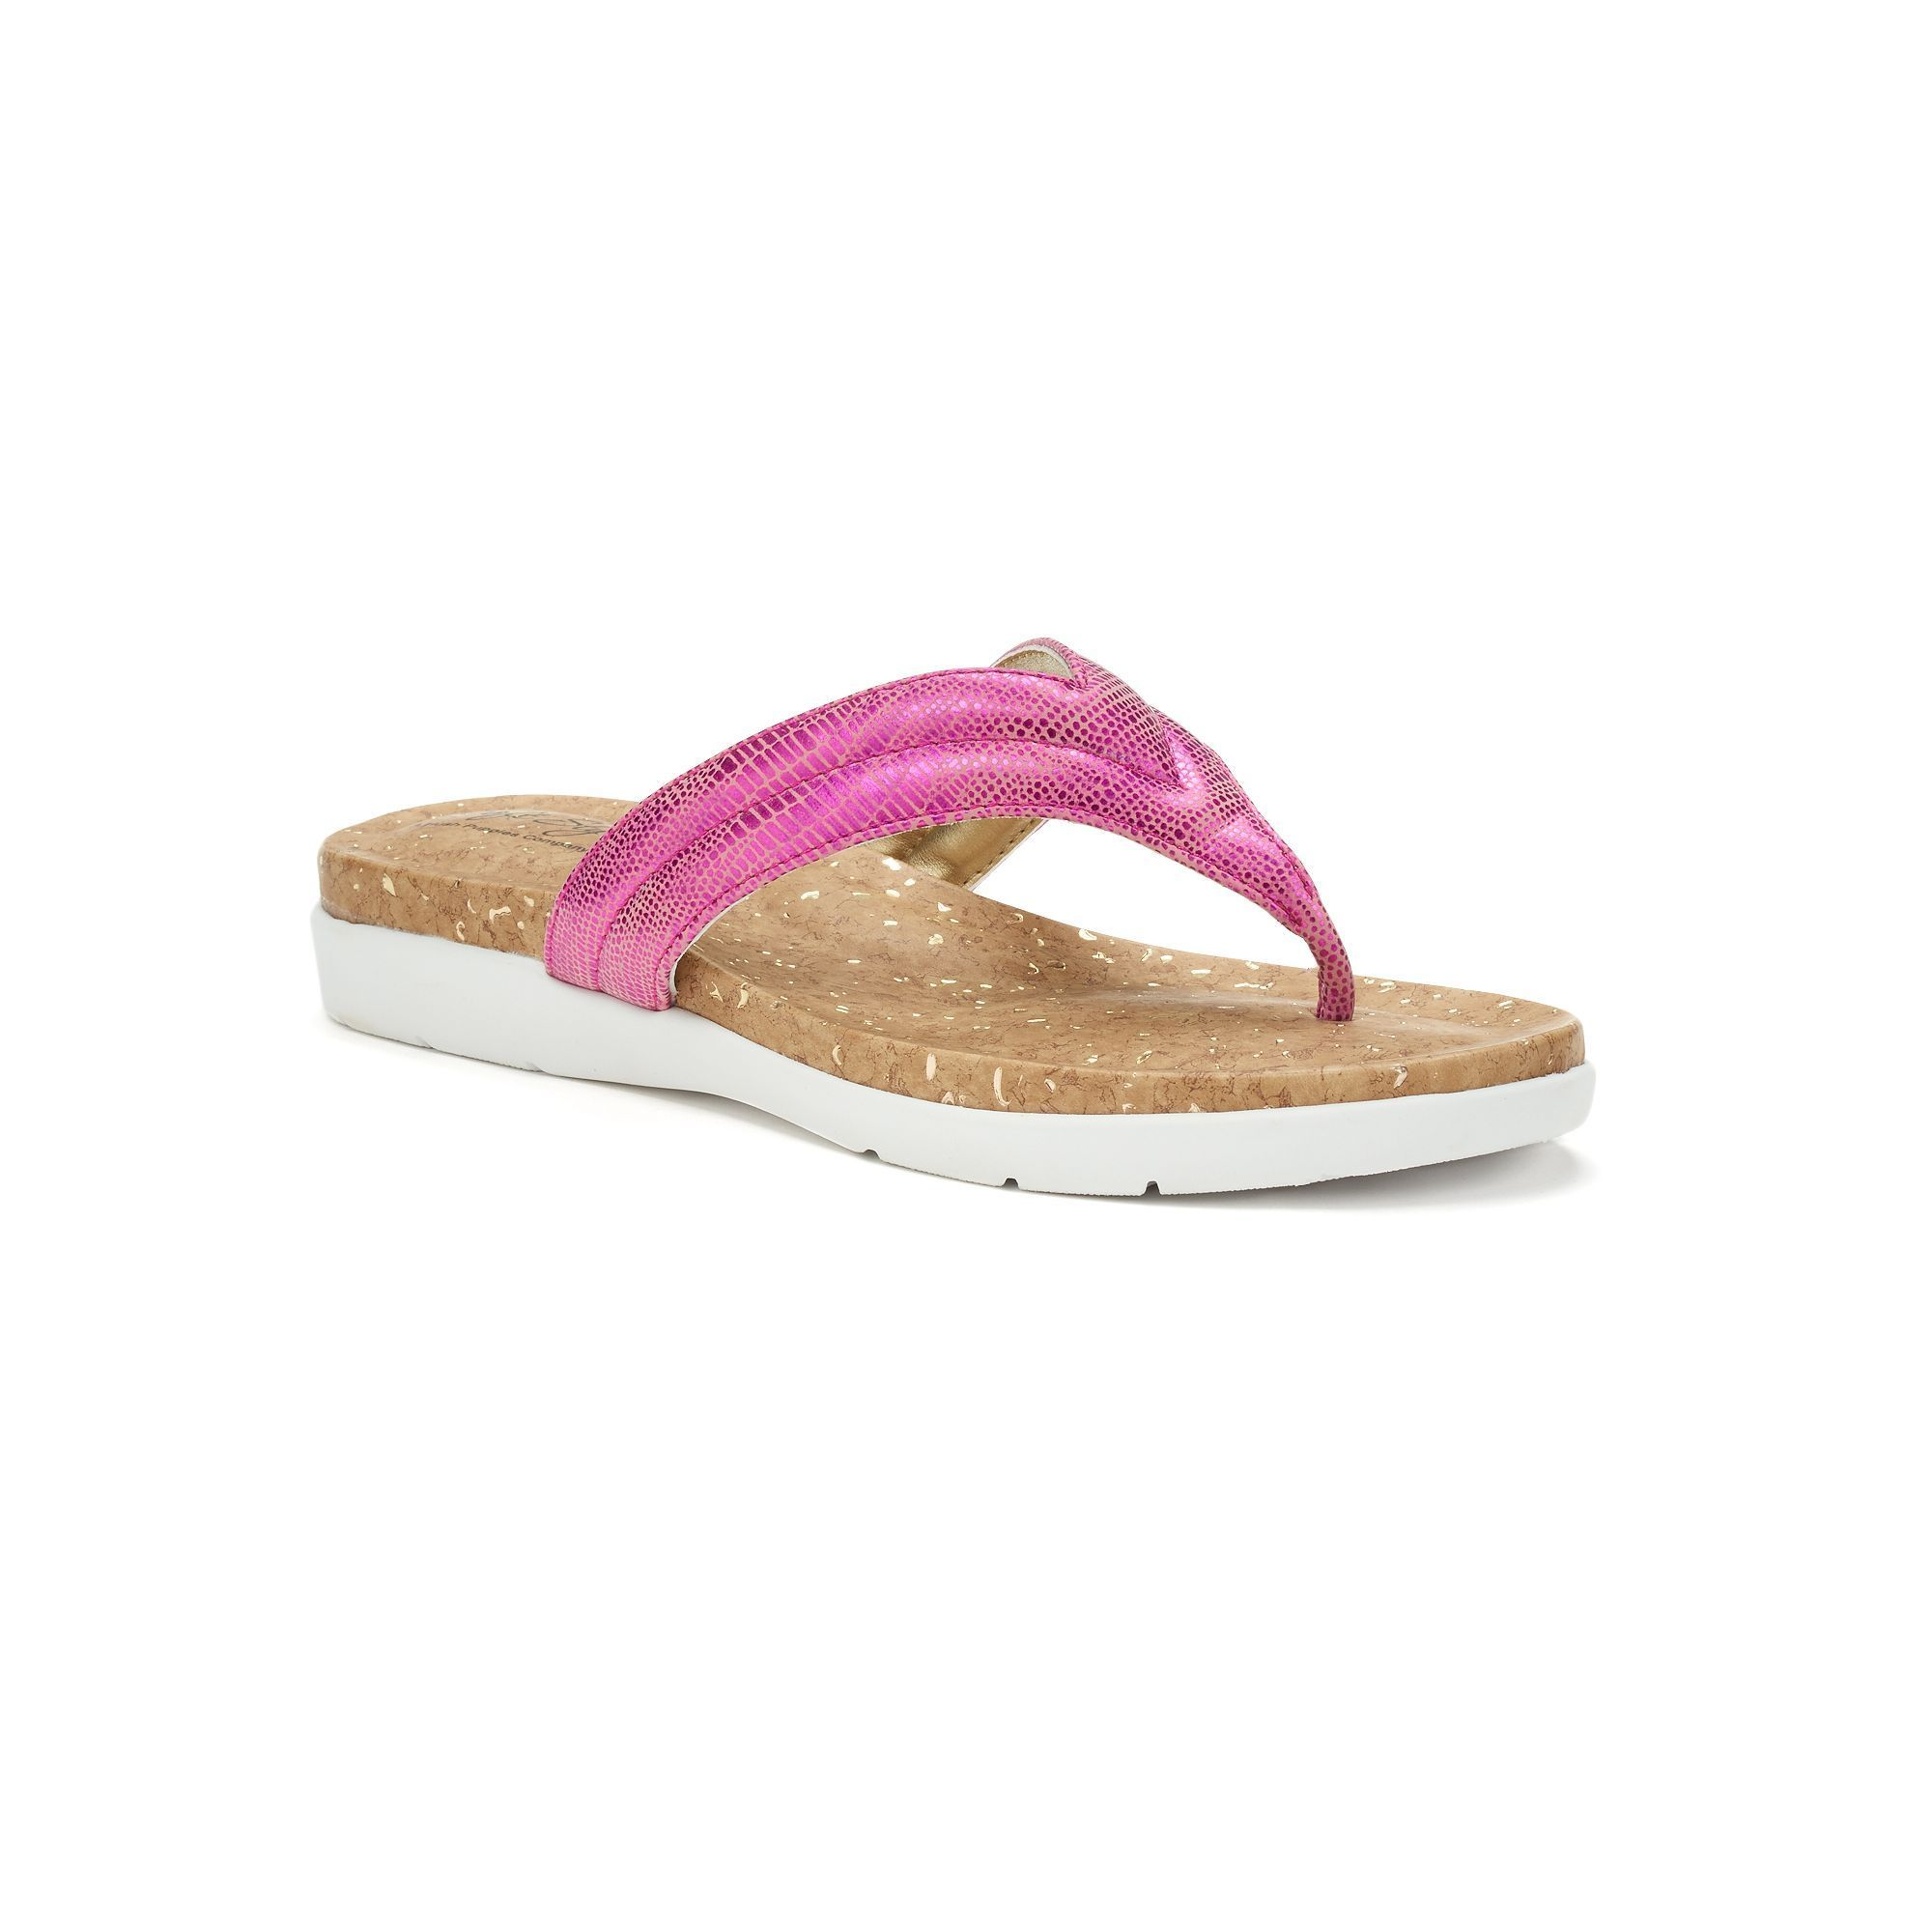 Soft Style by Hush Puppies Lizzy Women's Flip-Flops, Size: medium (8.5), Pink